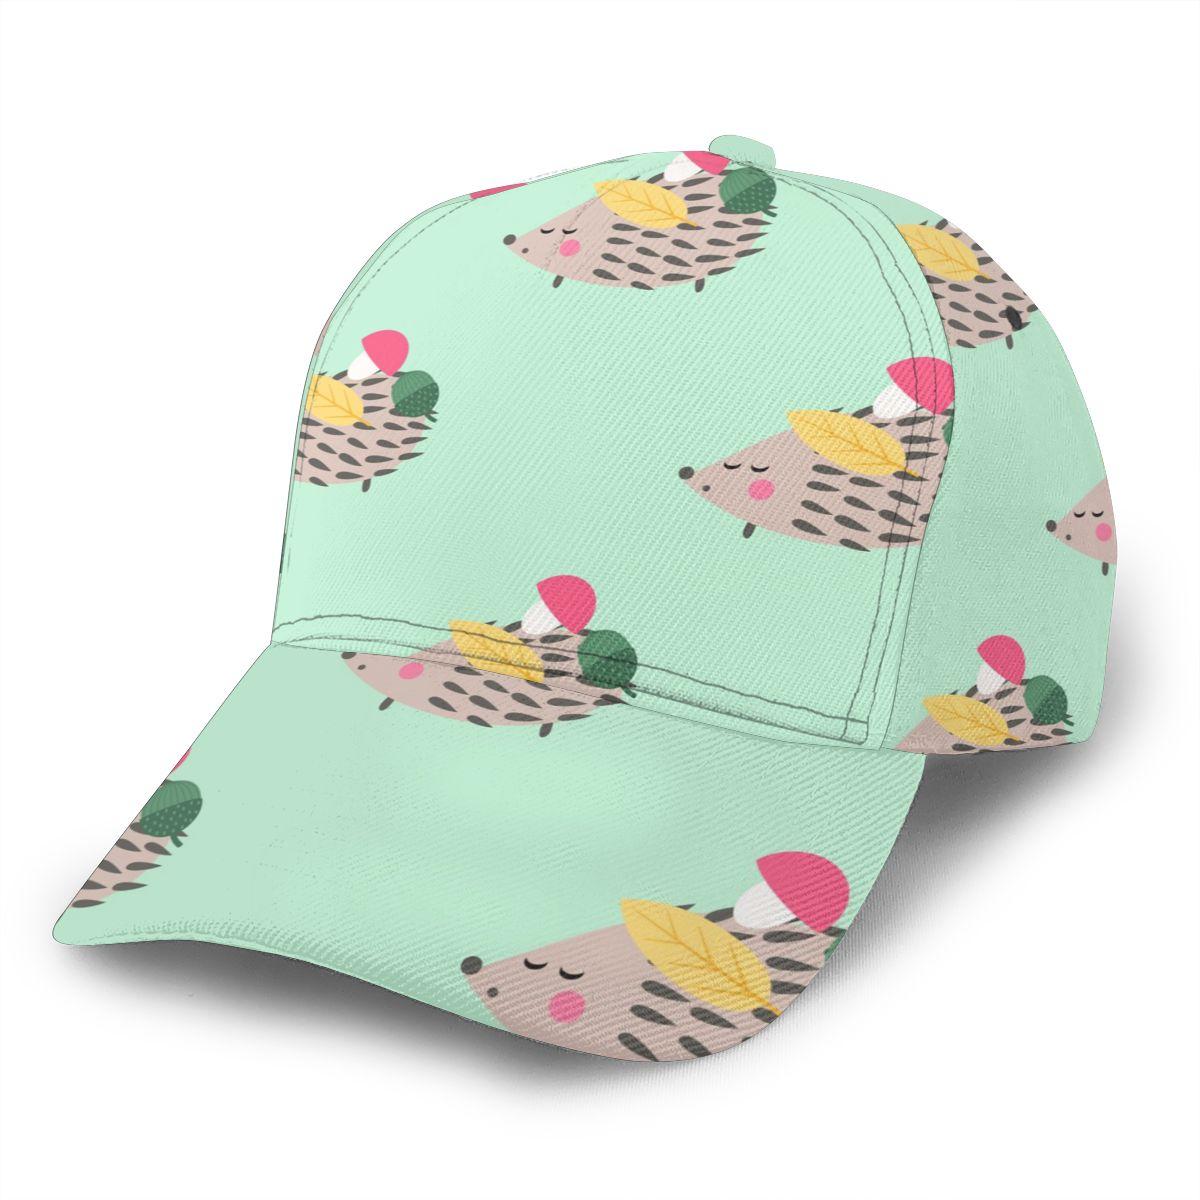 Hedgehog With Mushroom Acorn And Leaf Baseball Cap Fashion Men Hat Cap Summer Dad Hat Male Sports Hat